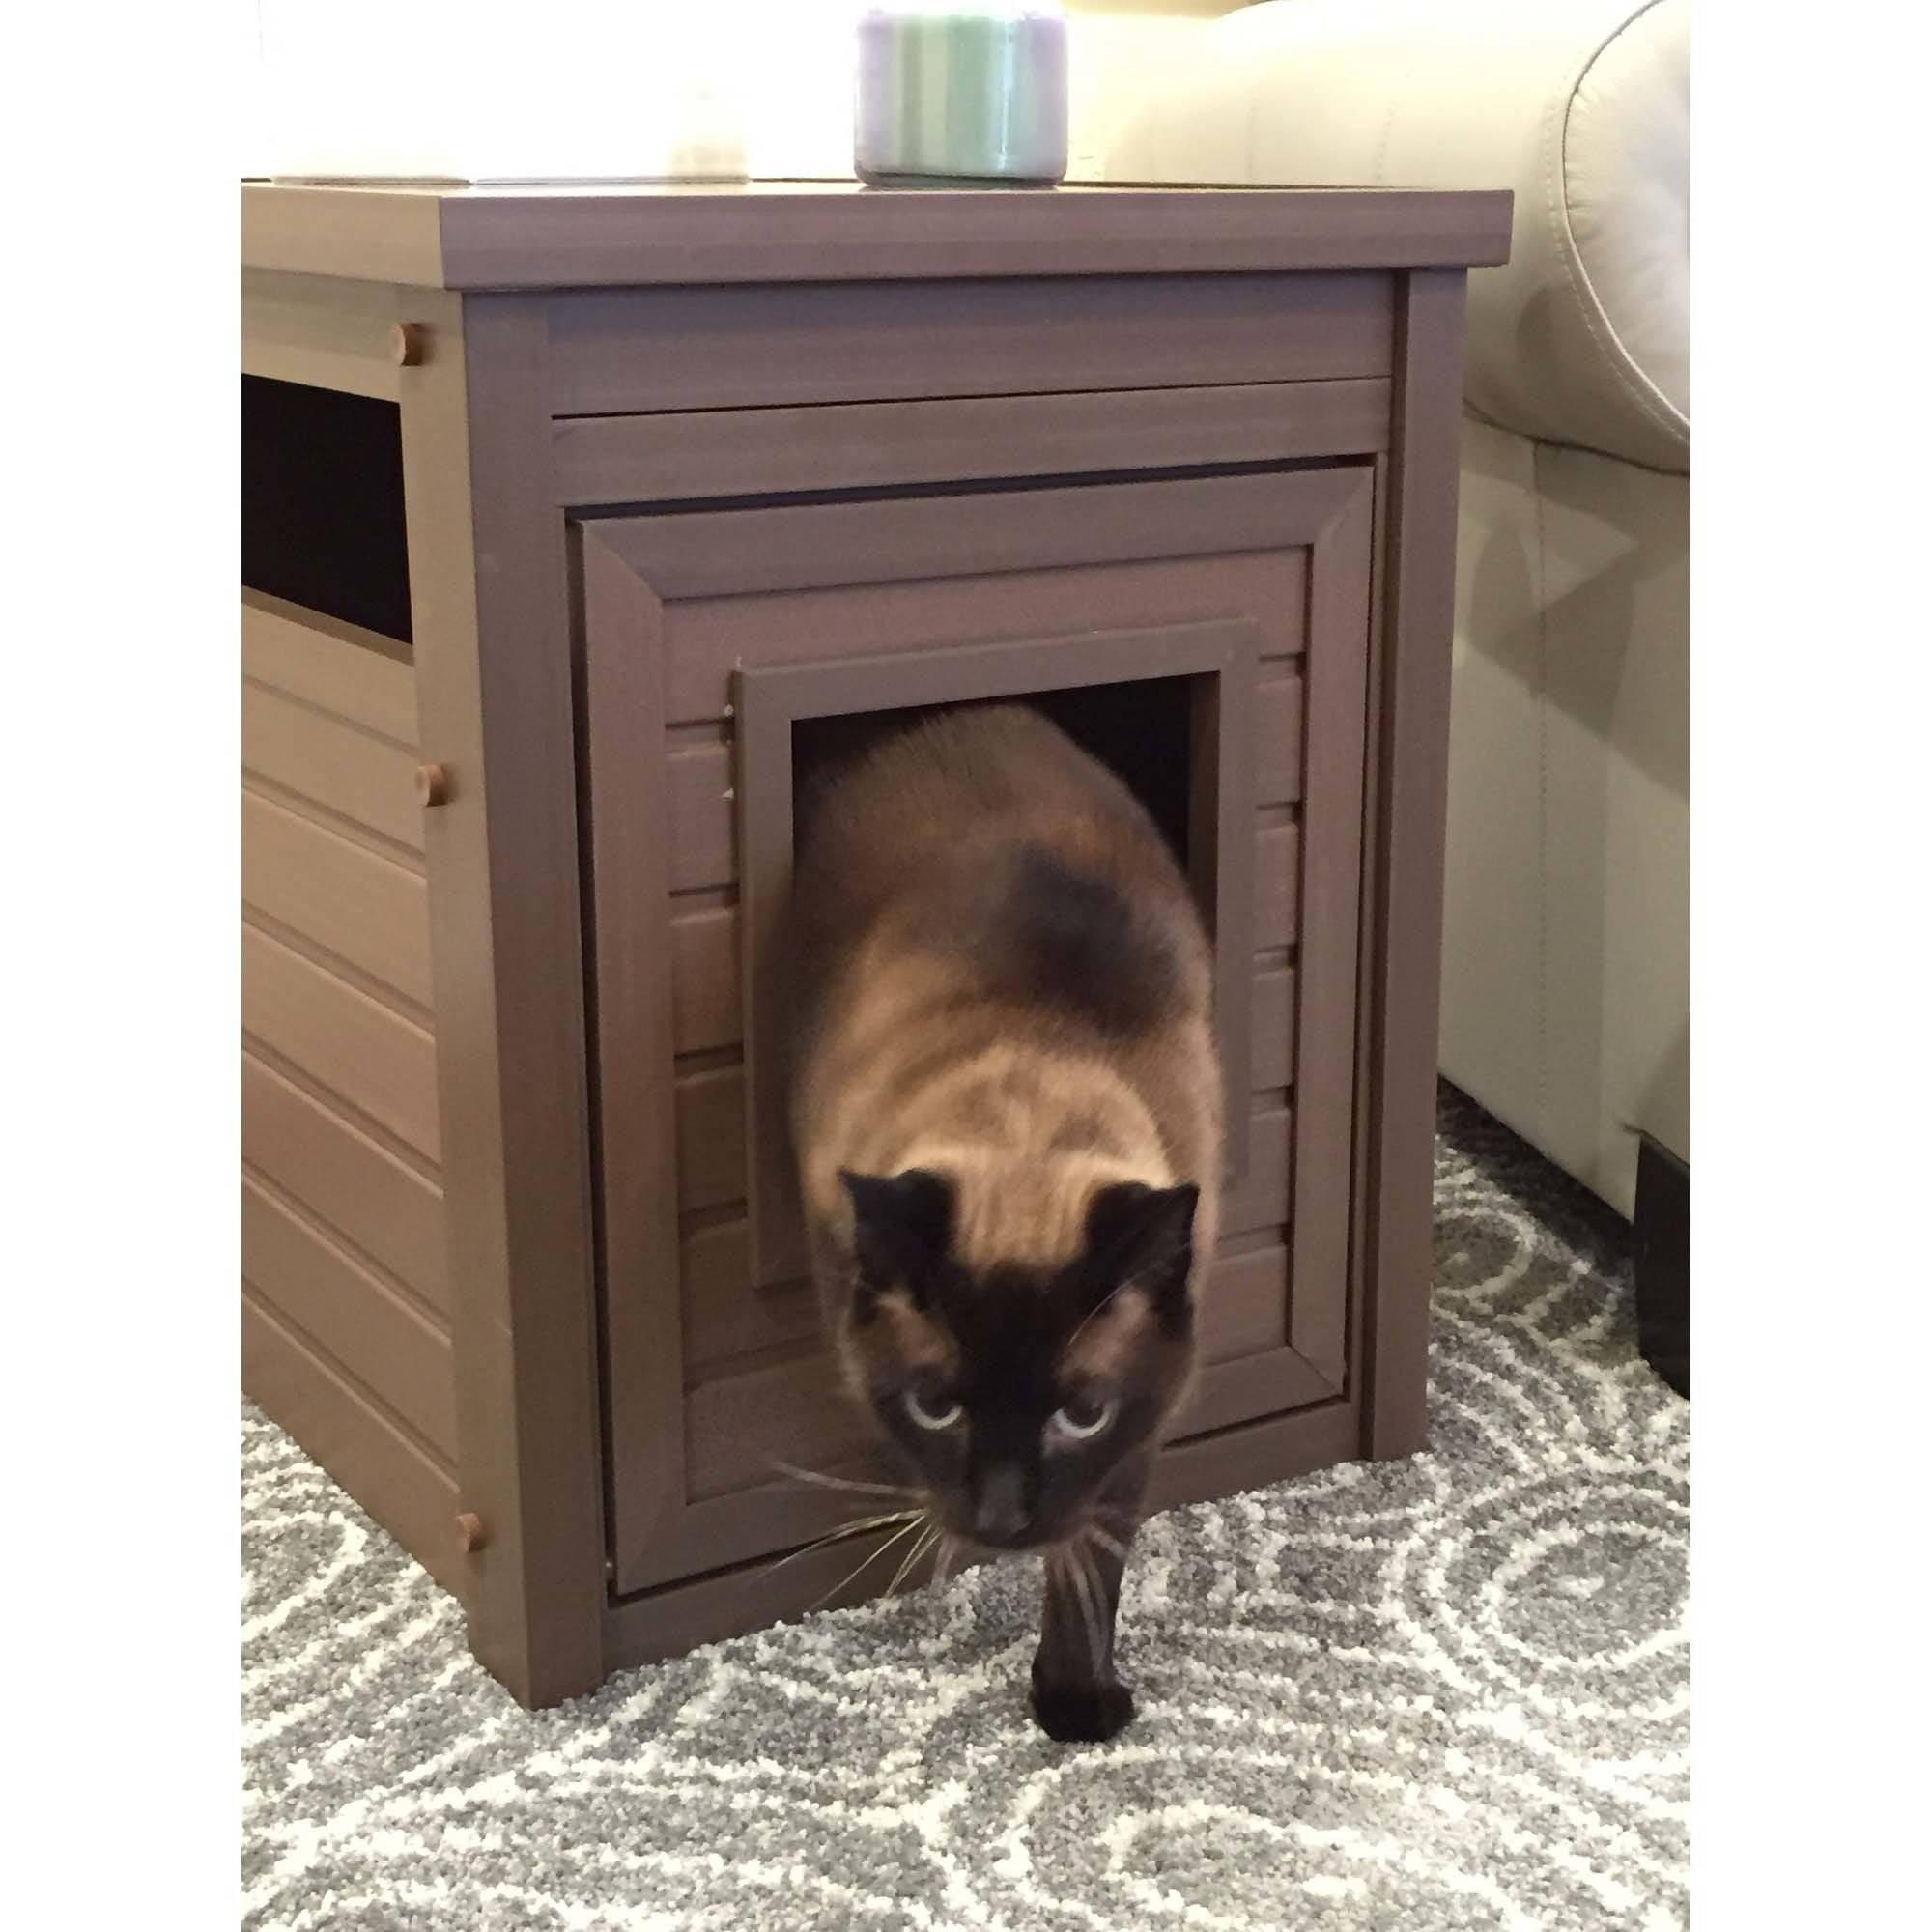 new age pet ecoflex habitat nu0027 home litter loo and jumbo litter loo now in 3 colors for cat russet ecoflex walmartcom - Litter Boxes